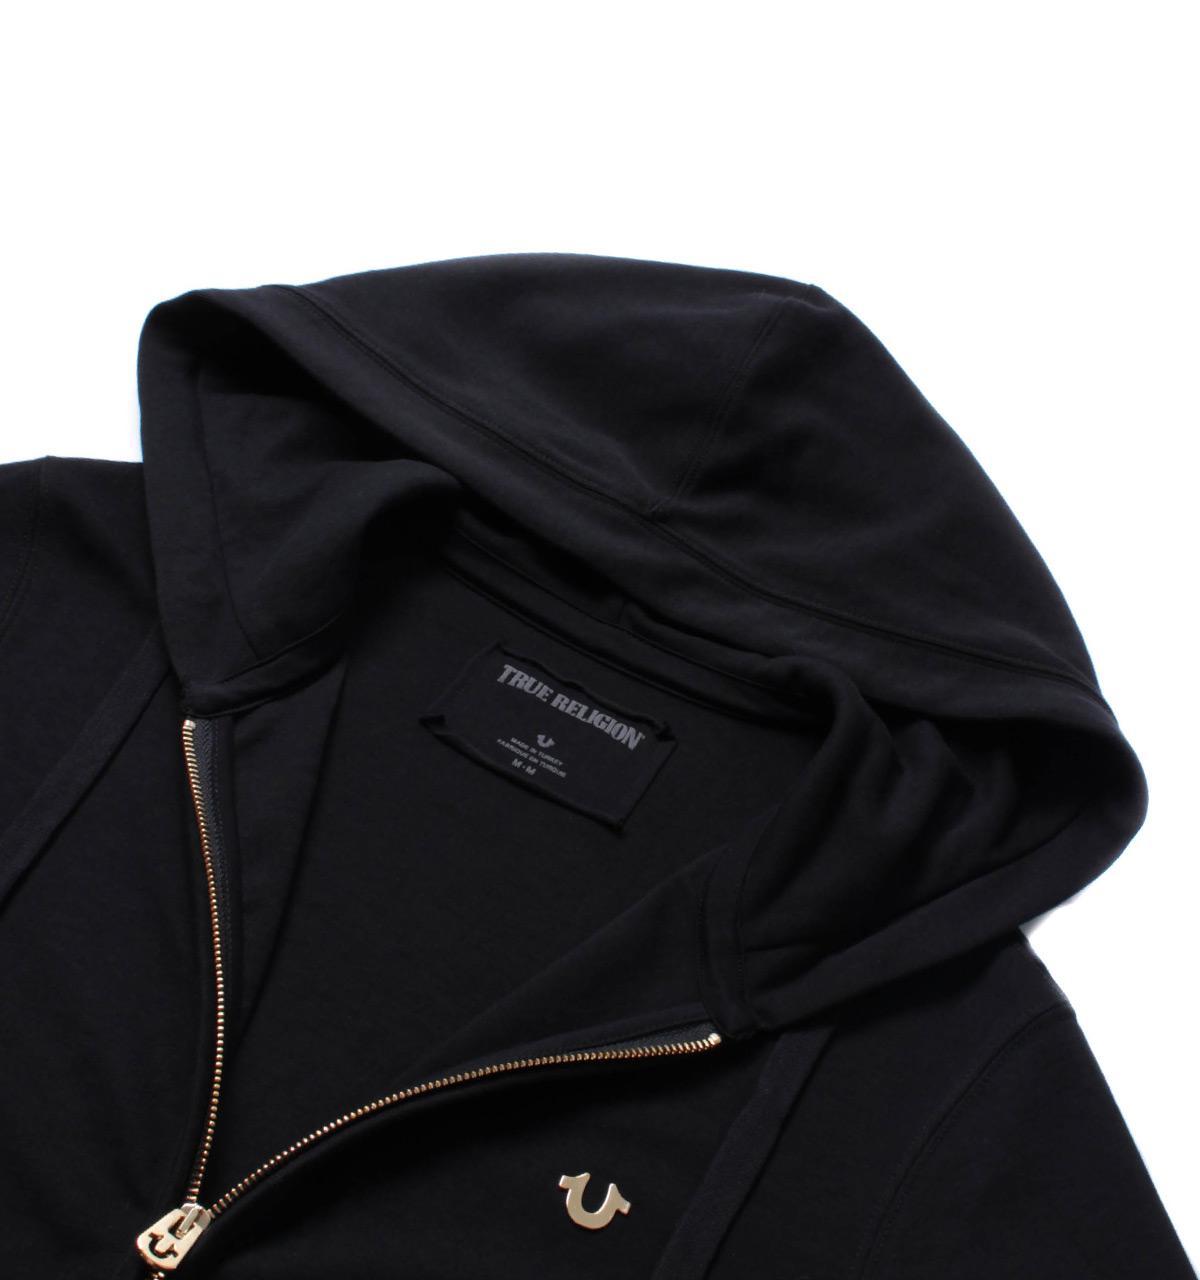 True Religion Denim Black Gold Zipper Overhead Hoodie for Men